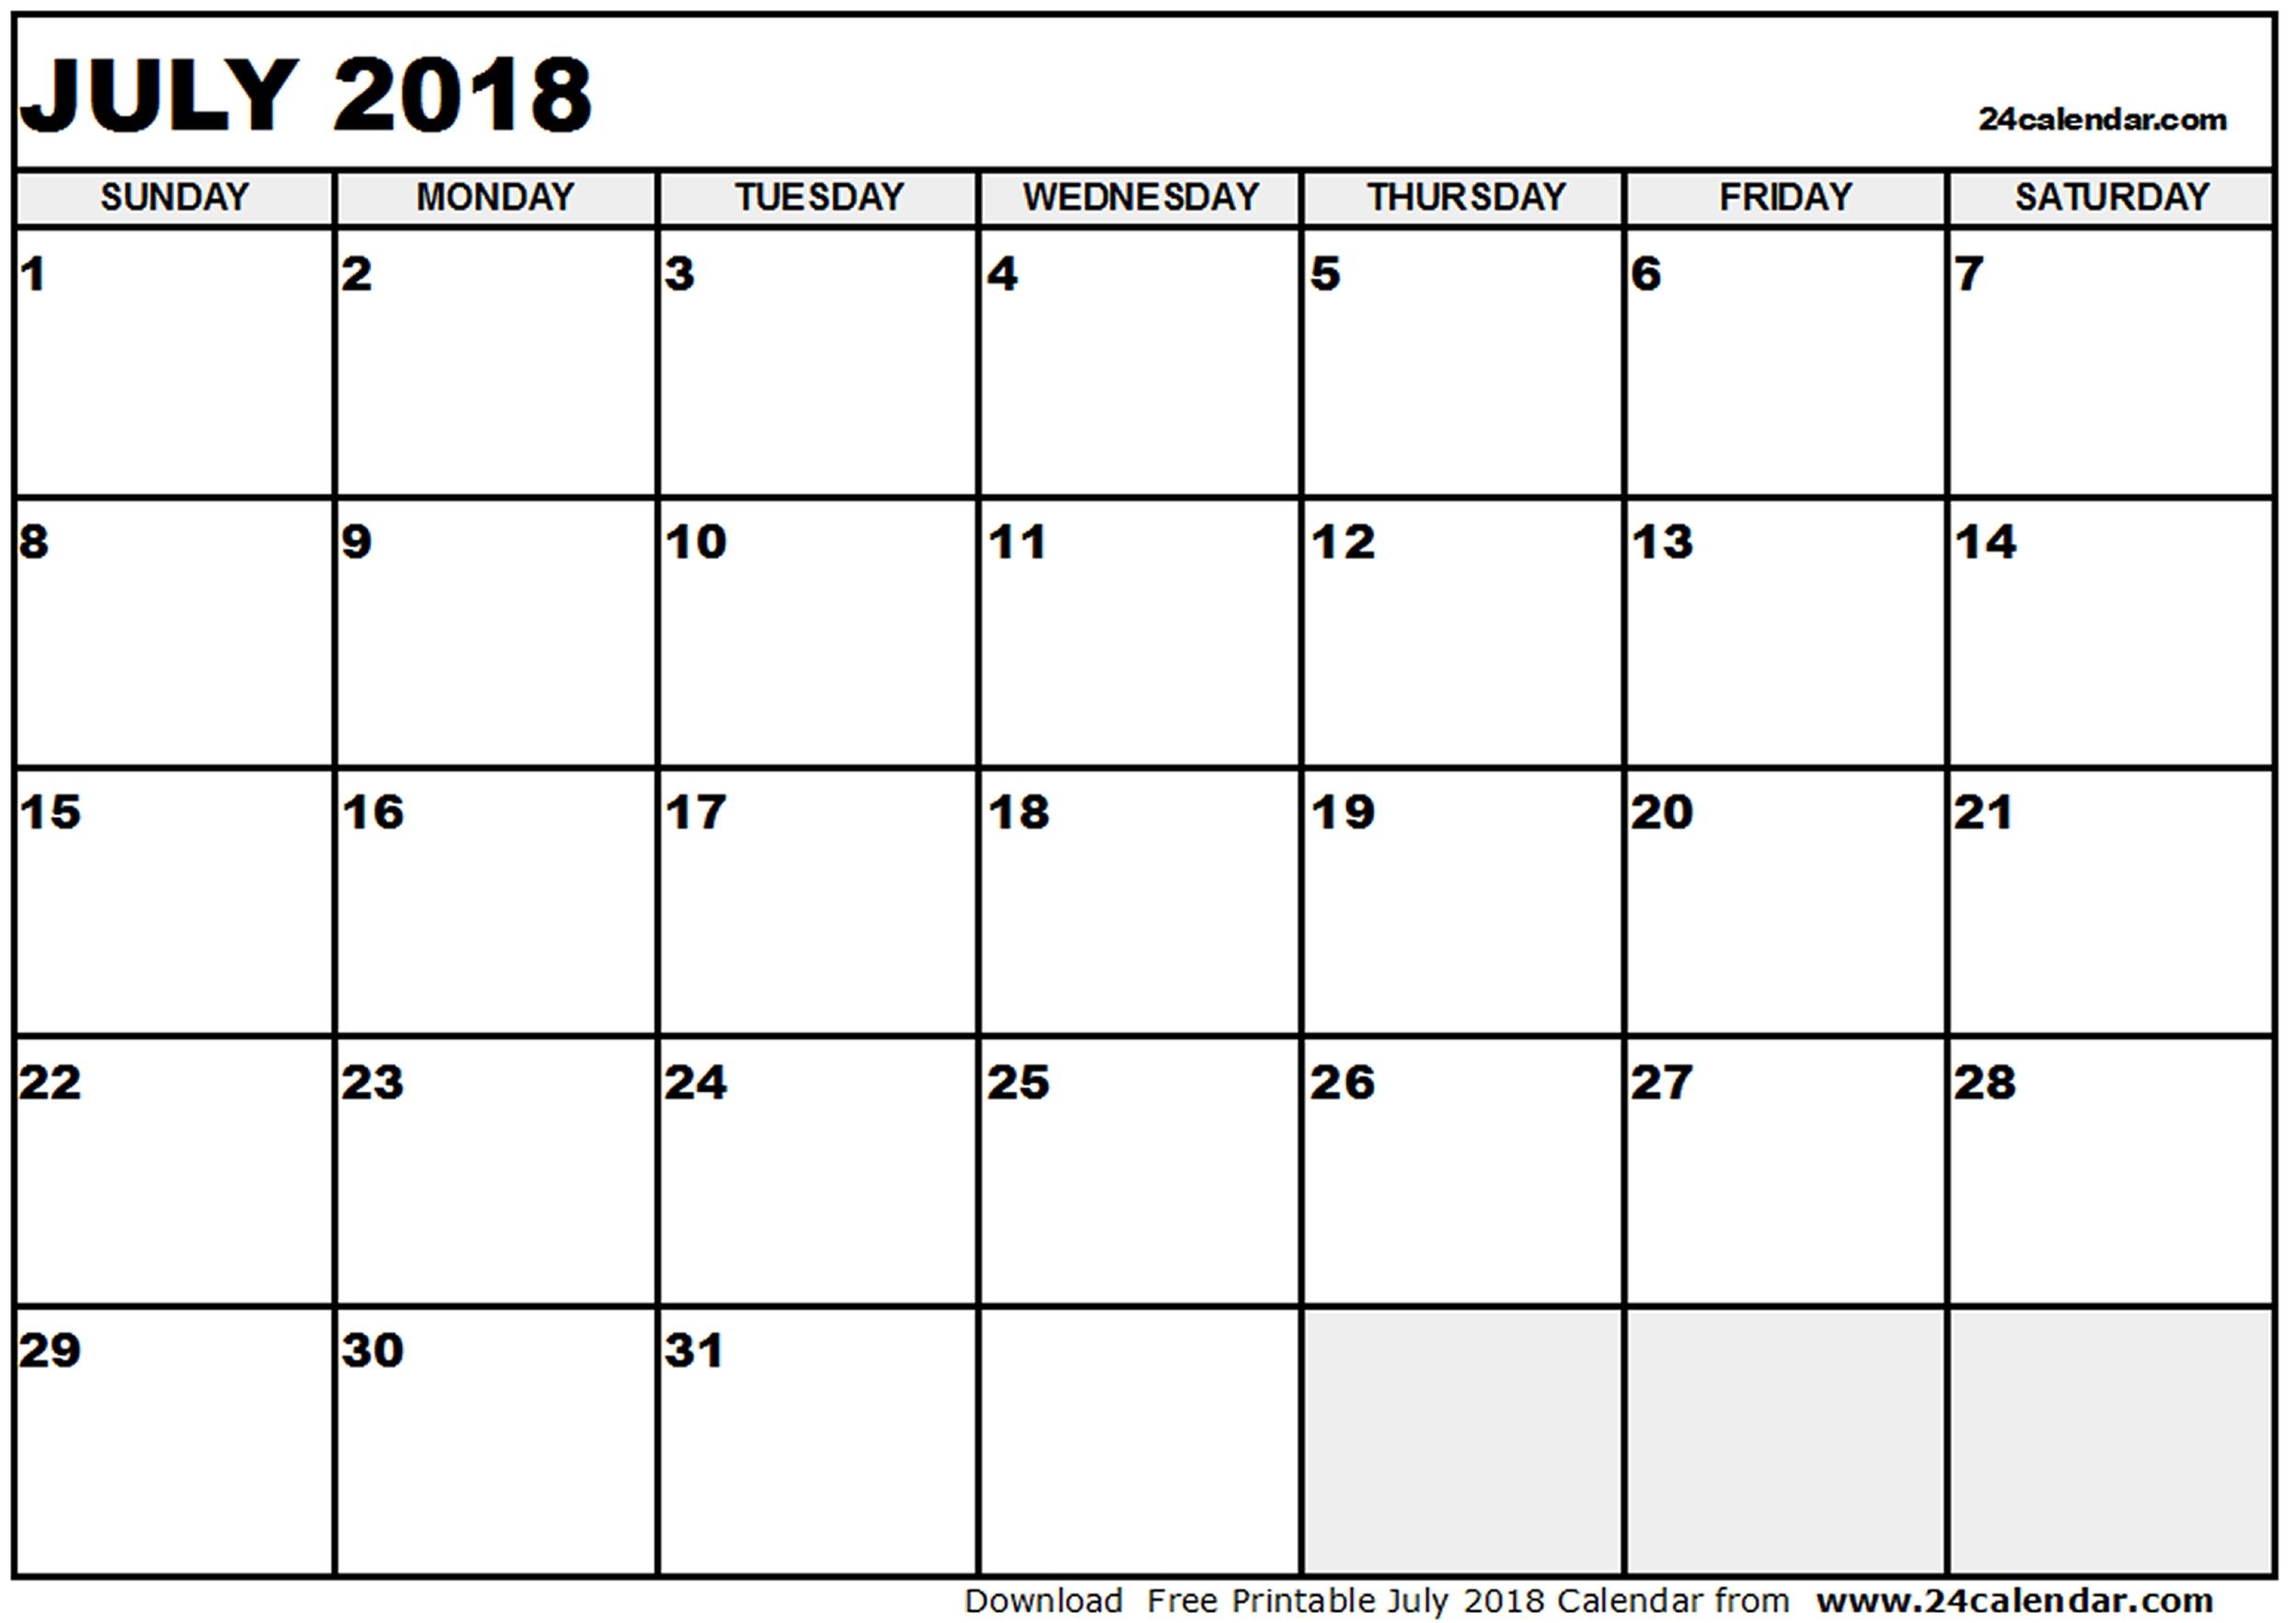 Editable Calendar July 2018 Endore Enhance Dentalco3abry